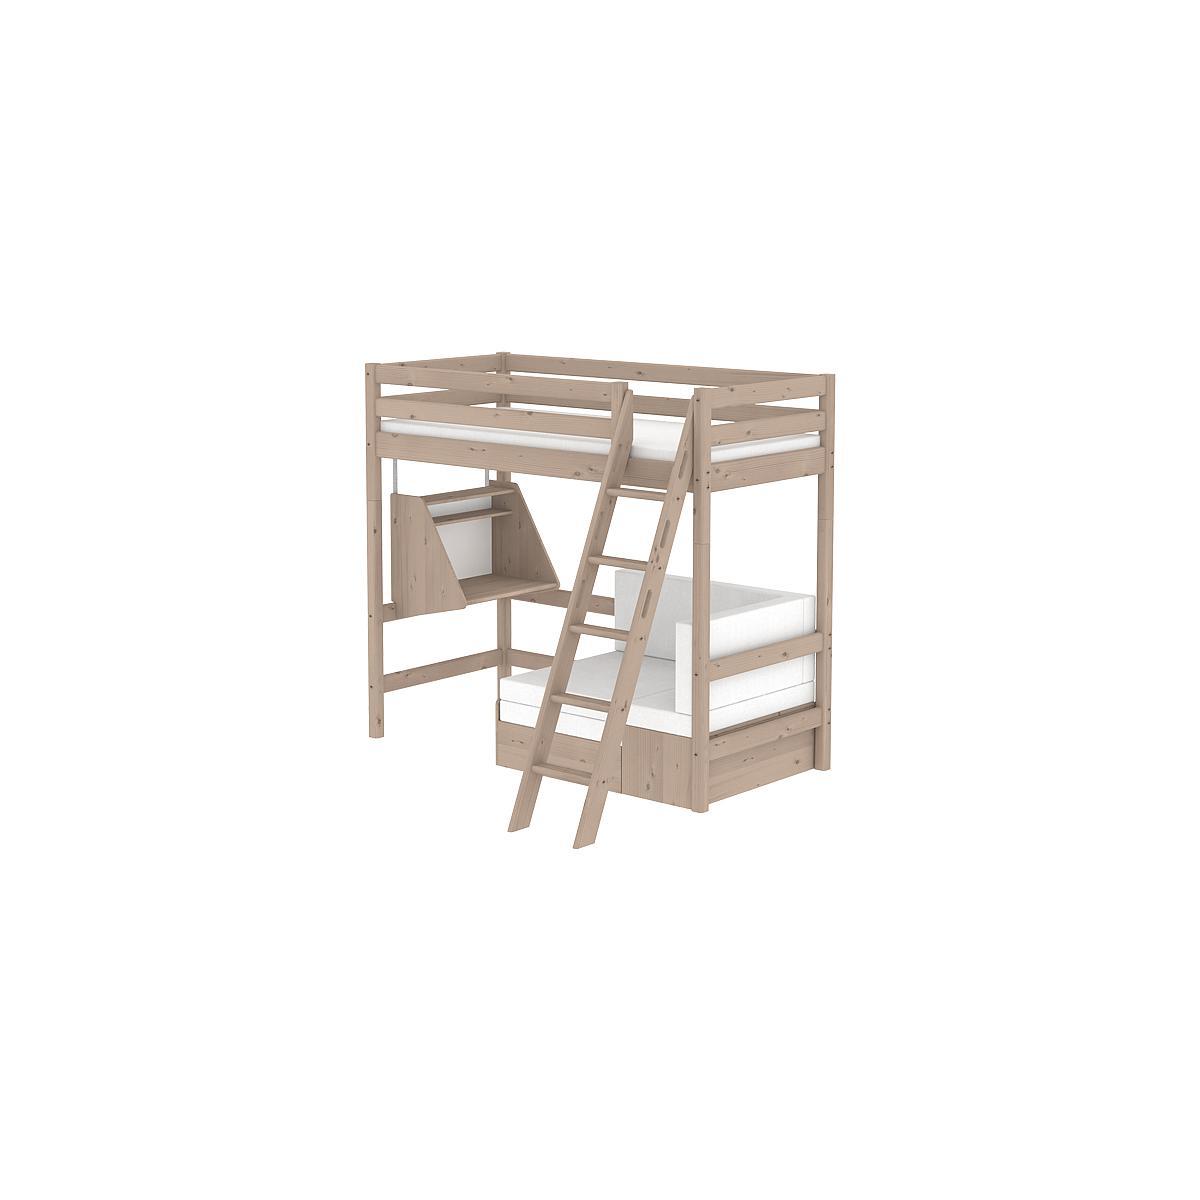 Cama alta Casa 90x200 CLASSIC Flexa escalera inclinada terra